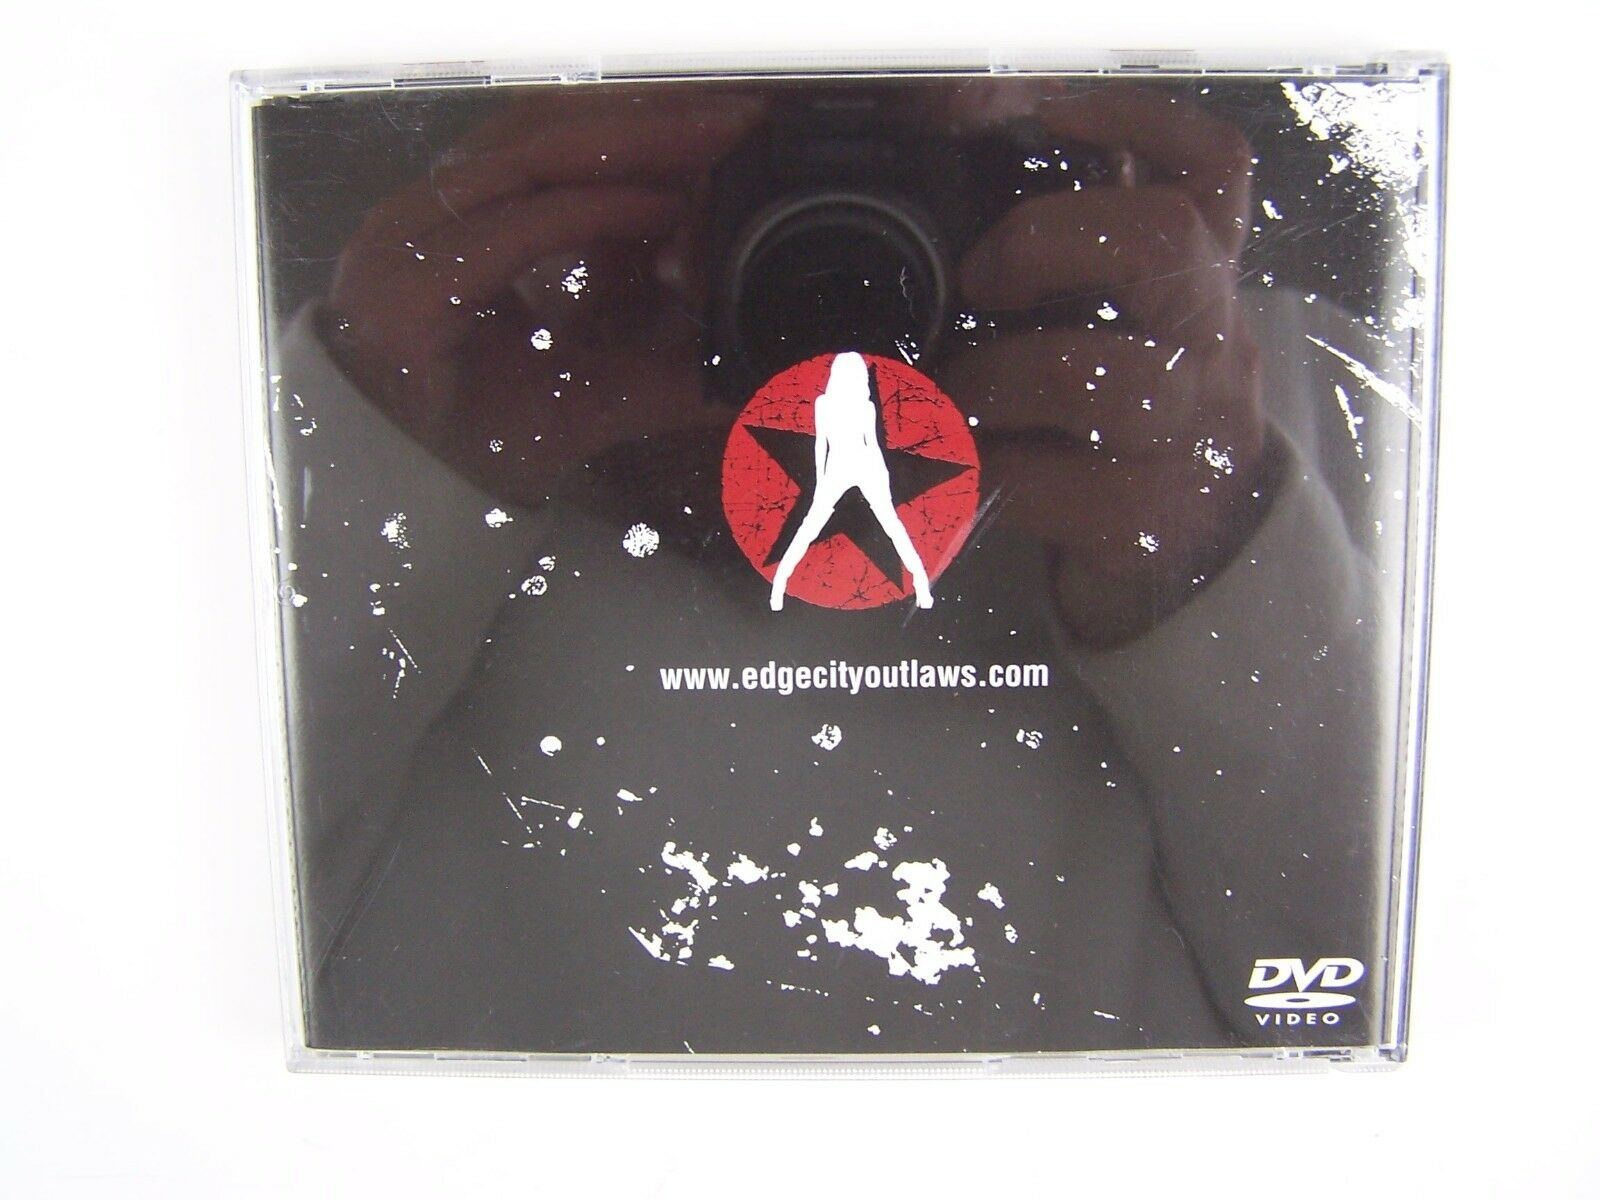 Edge City Outlaws - Woman & Wine Video DVD ~RaRe!